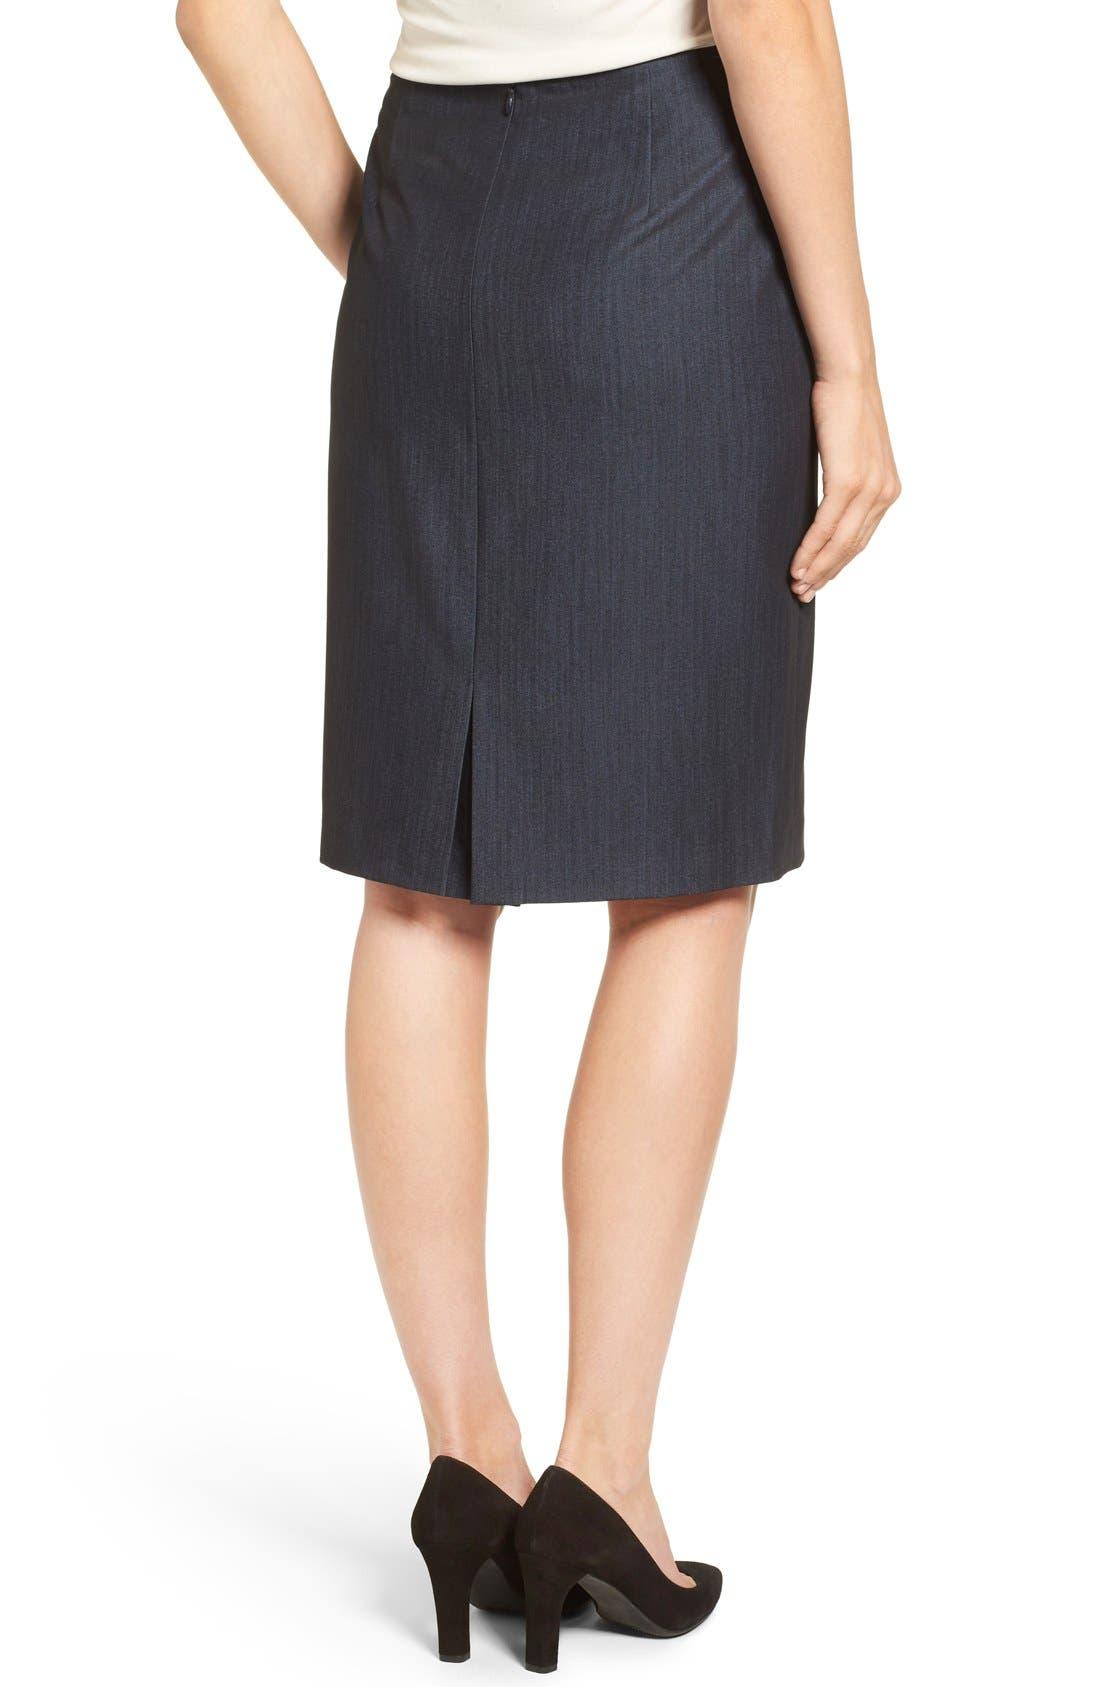 ANNE KLEIN, Stretch Woven Suit Skirt, Alternate thumbnail 2, color, INDIGO TWILL